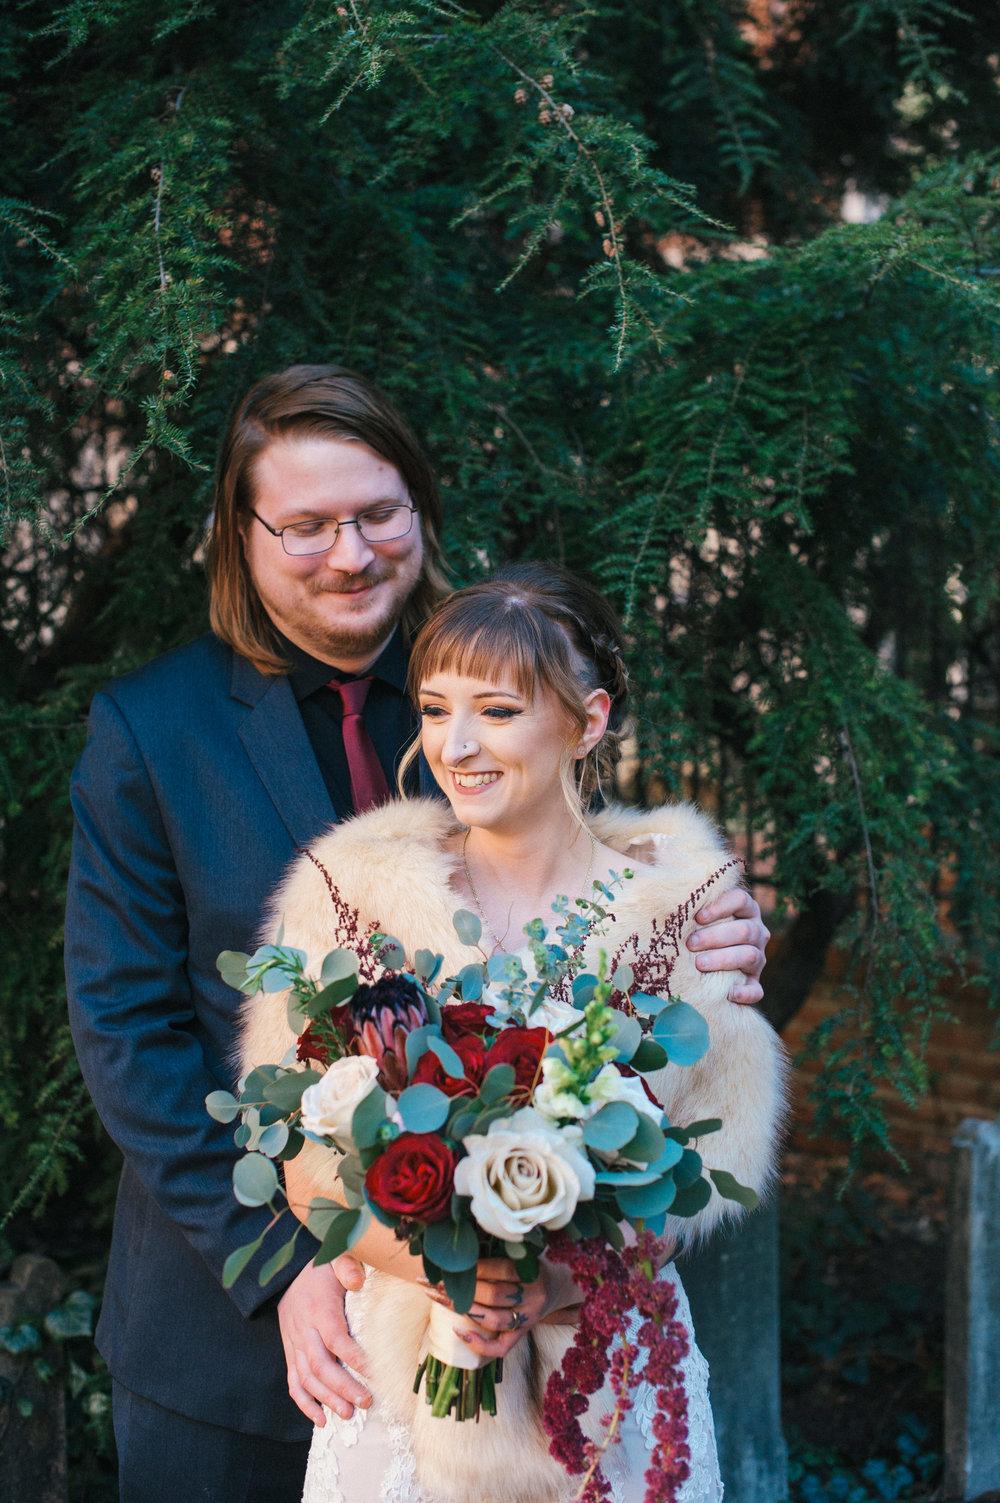 Amber and Kyles Wedding 86.jpg